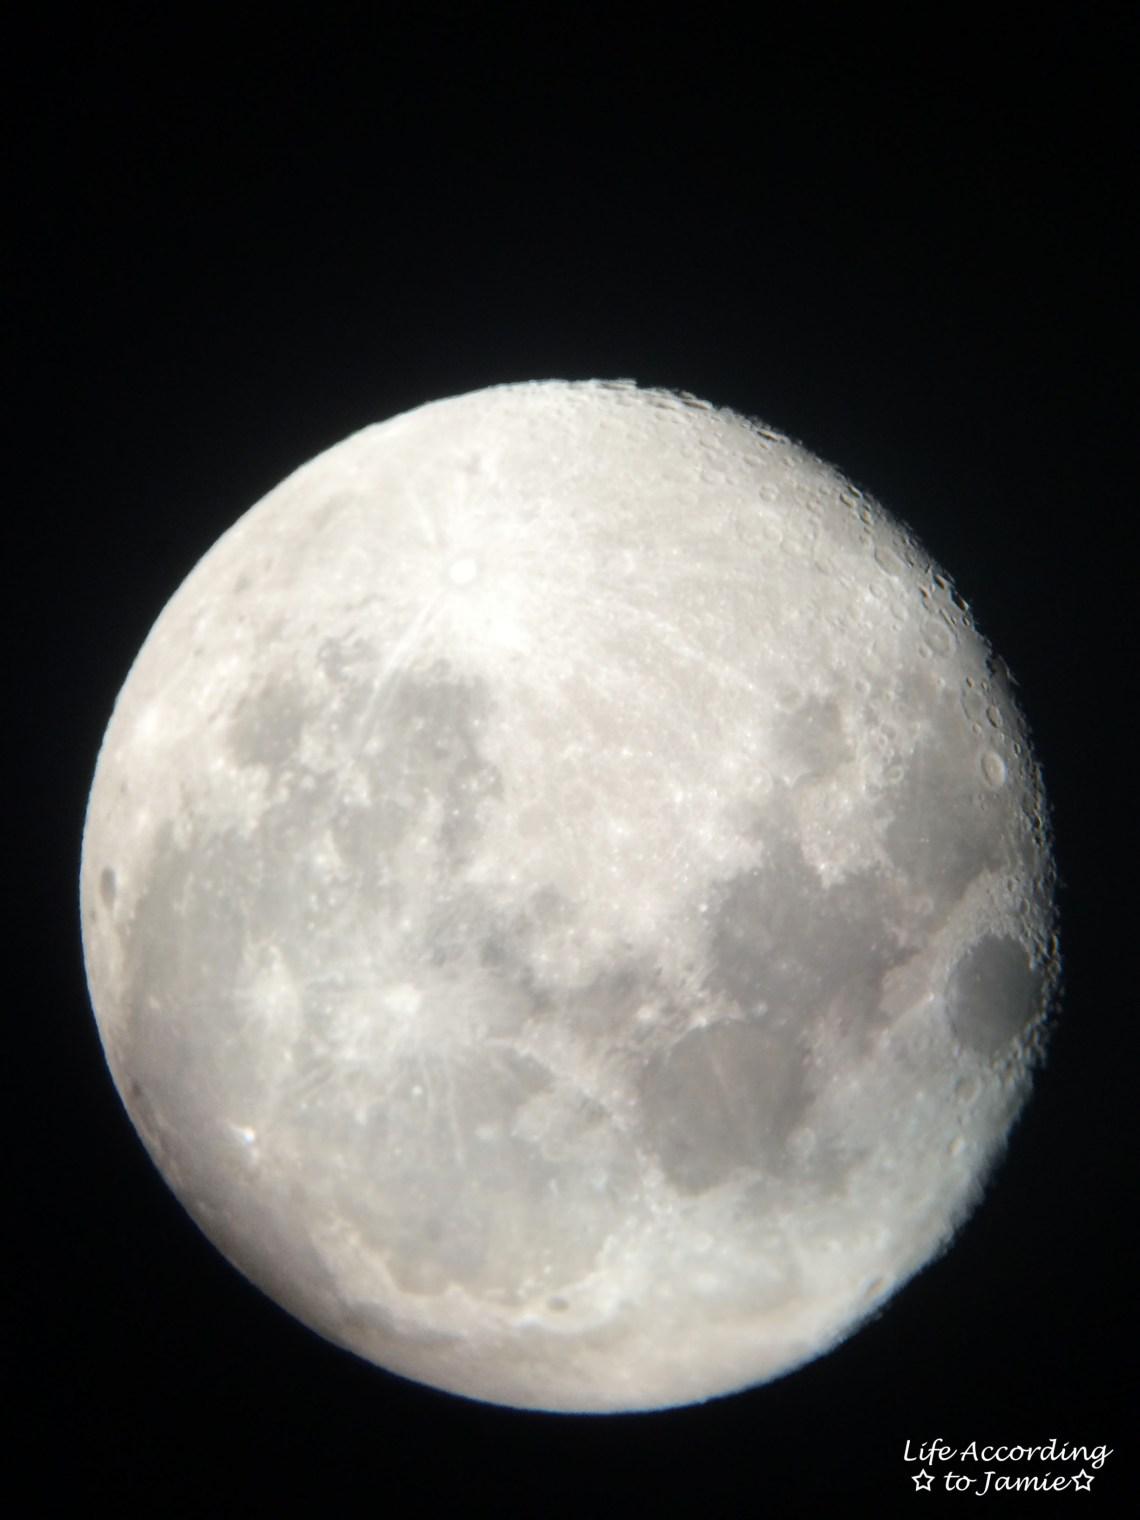 Moon through telescope